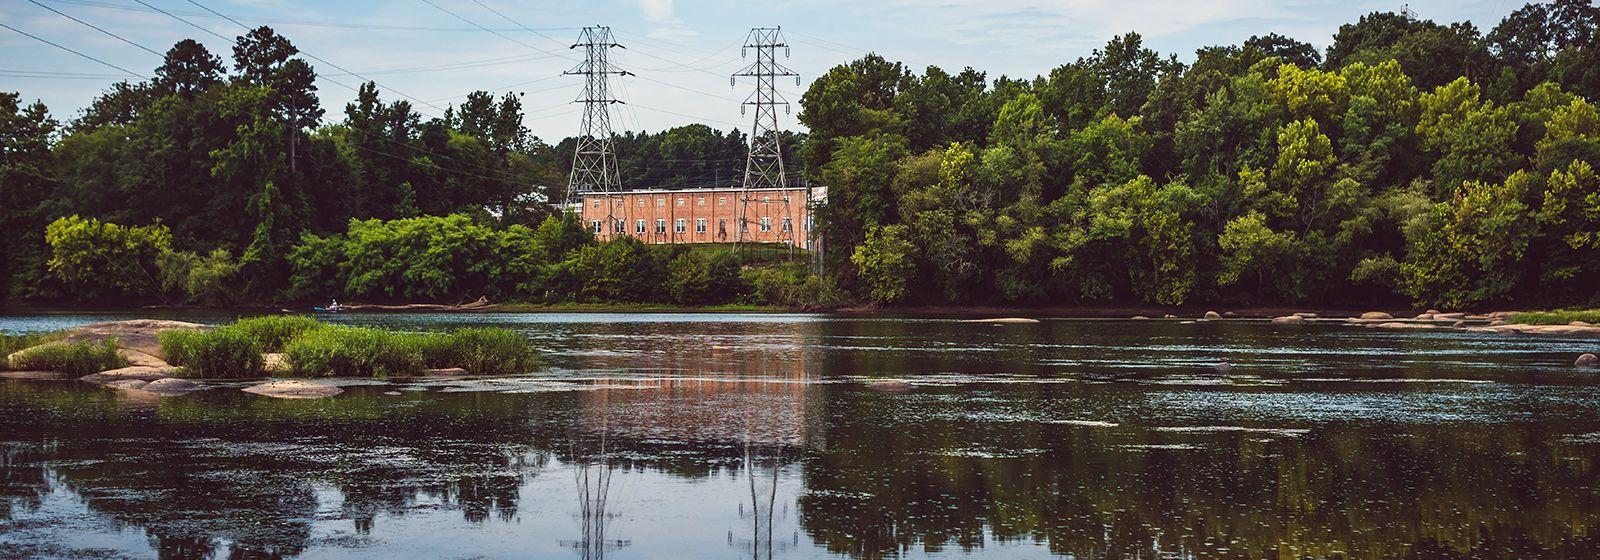 A Powerhouse On The Pee Dee River Duke Energy Illumination